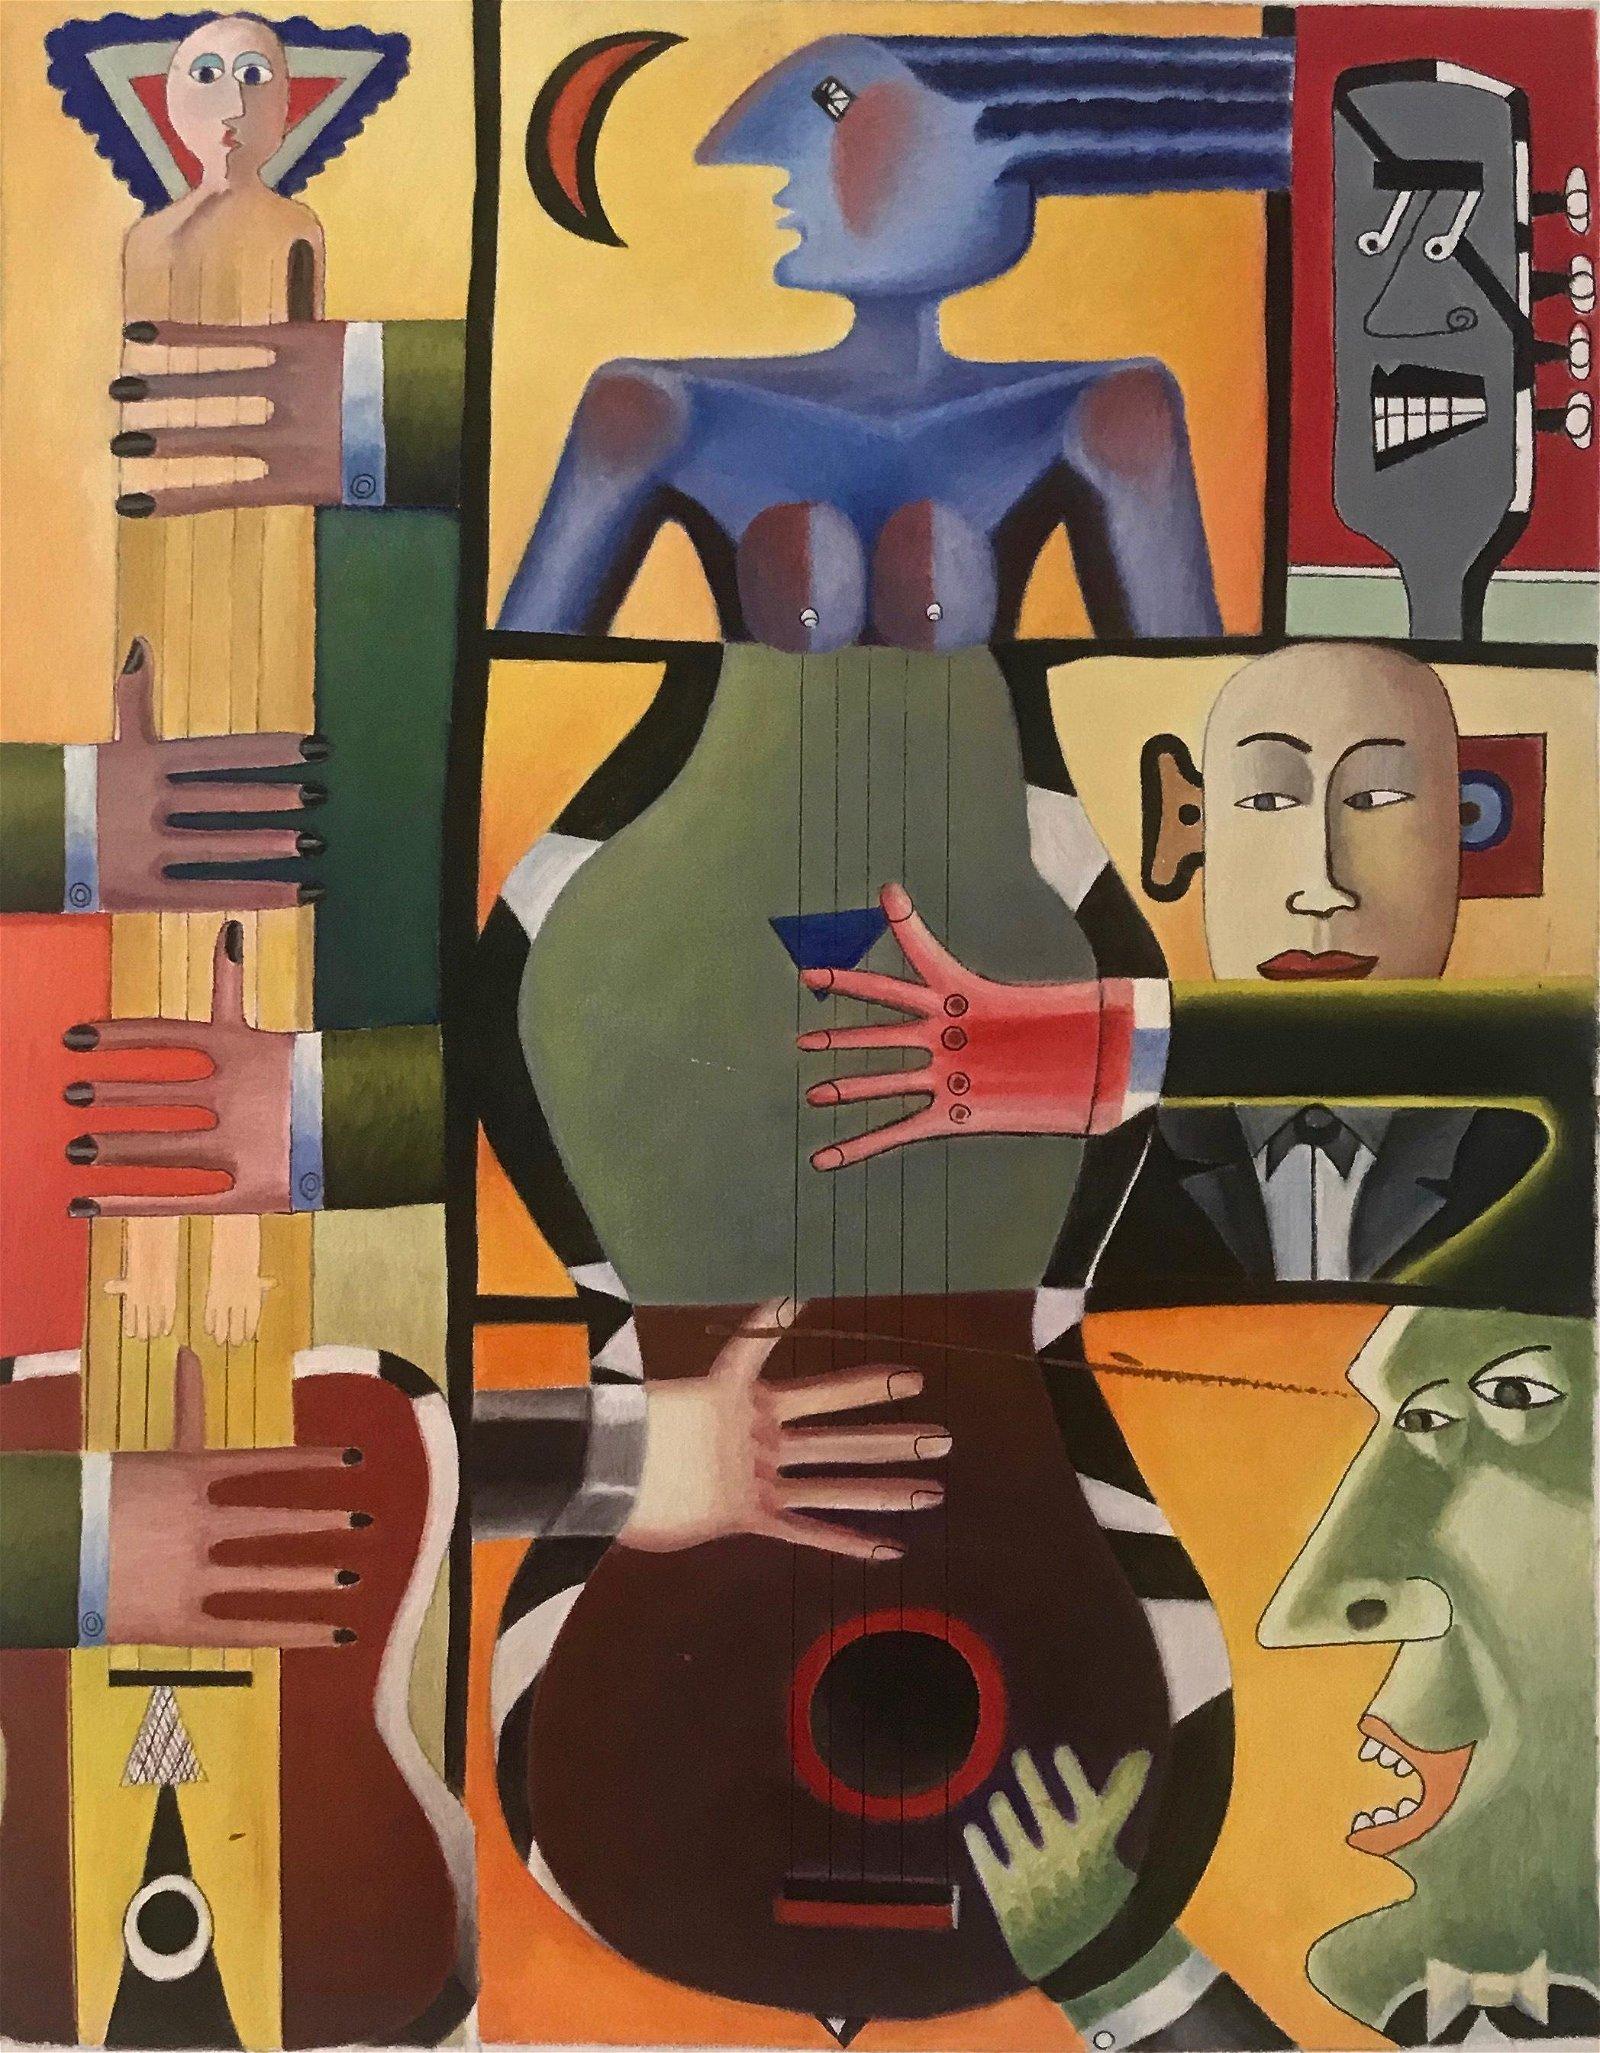 Modern Cubist Abstract Pop Art Oil Painting, 1960s